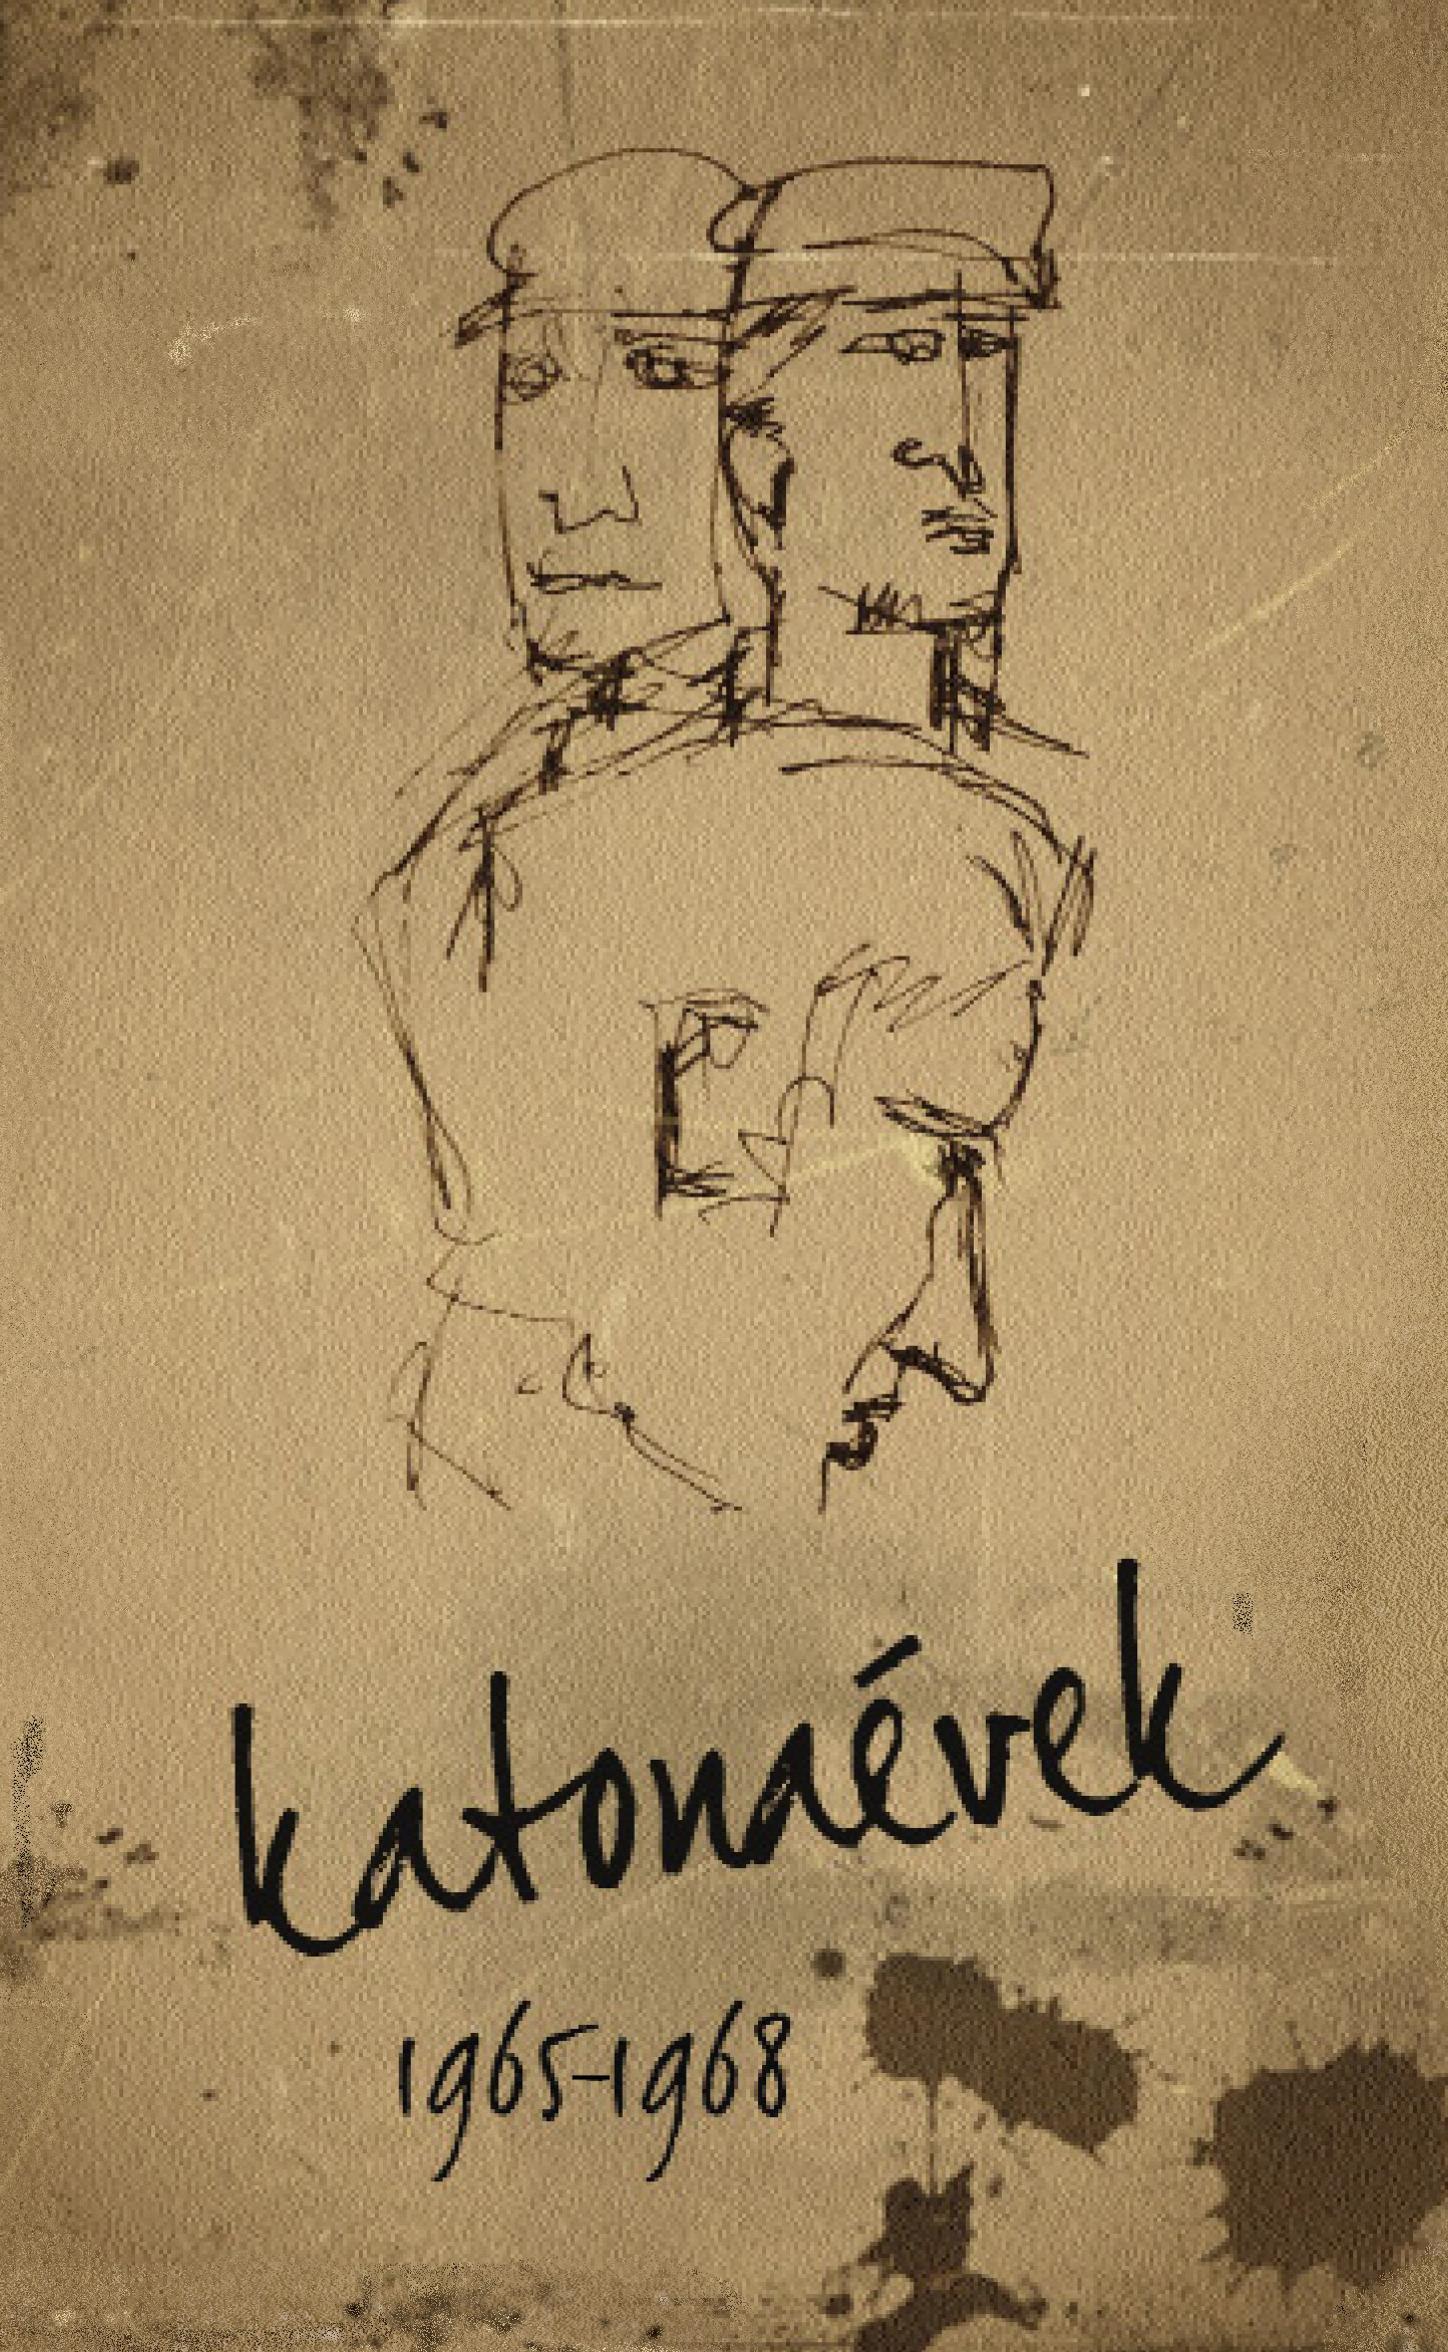 KATONAÉVEK 1965-1968